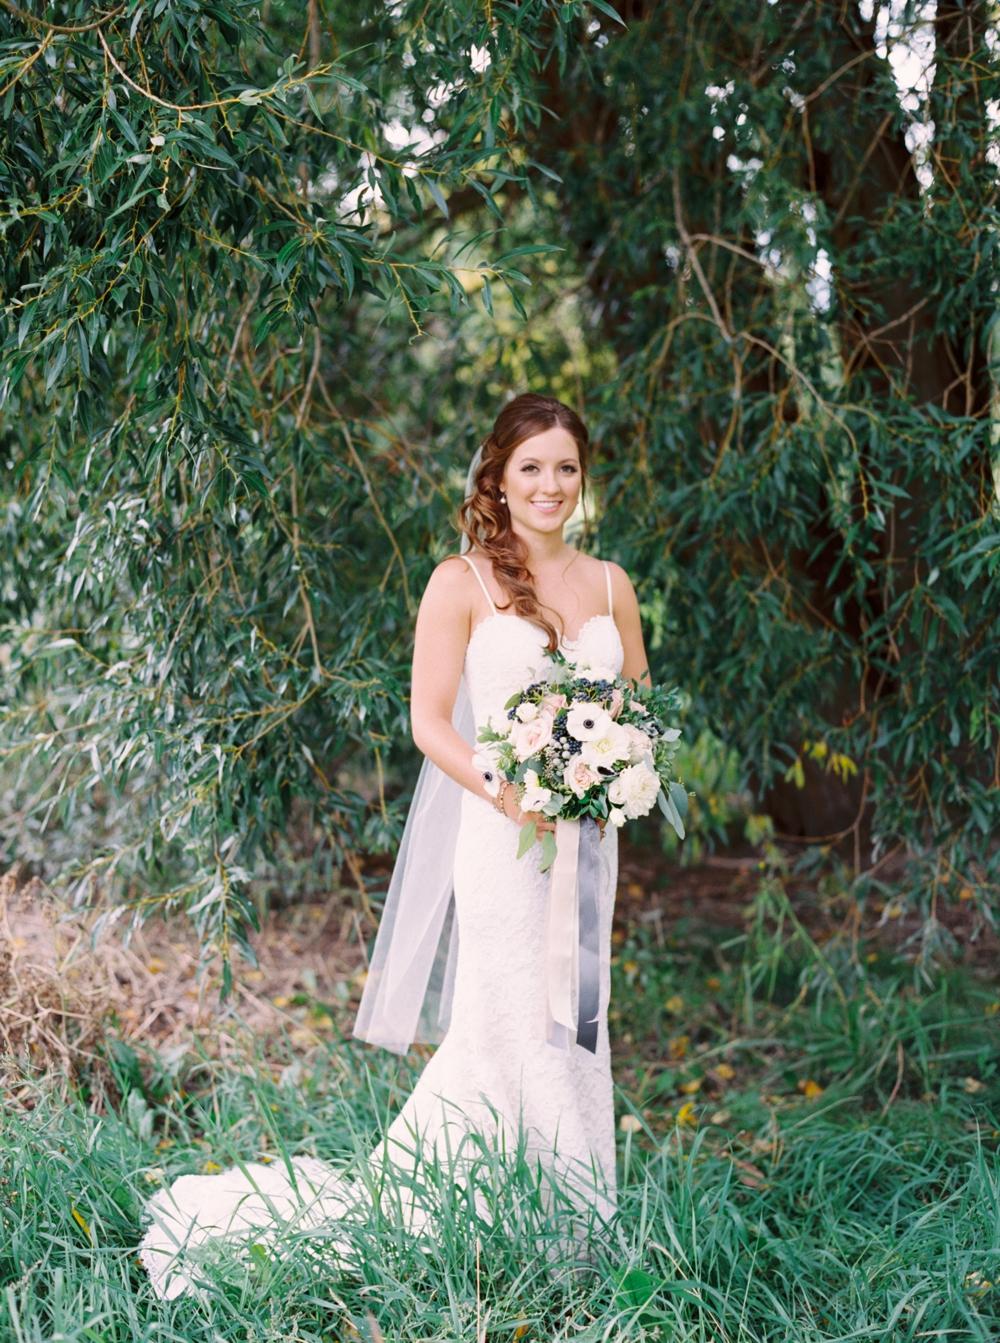 Calgary wedding photographers | scottish wedding | the lake house calgary wedding | fine art film photographers | fall september wedding